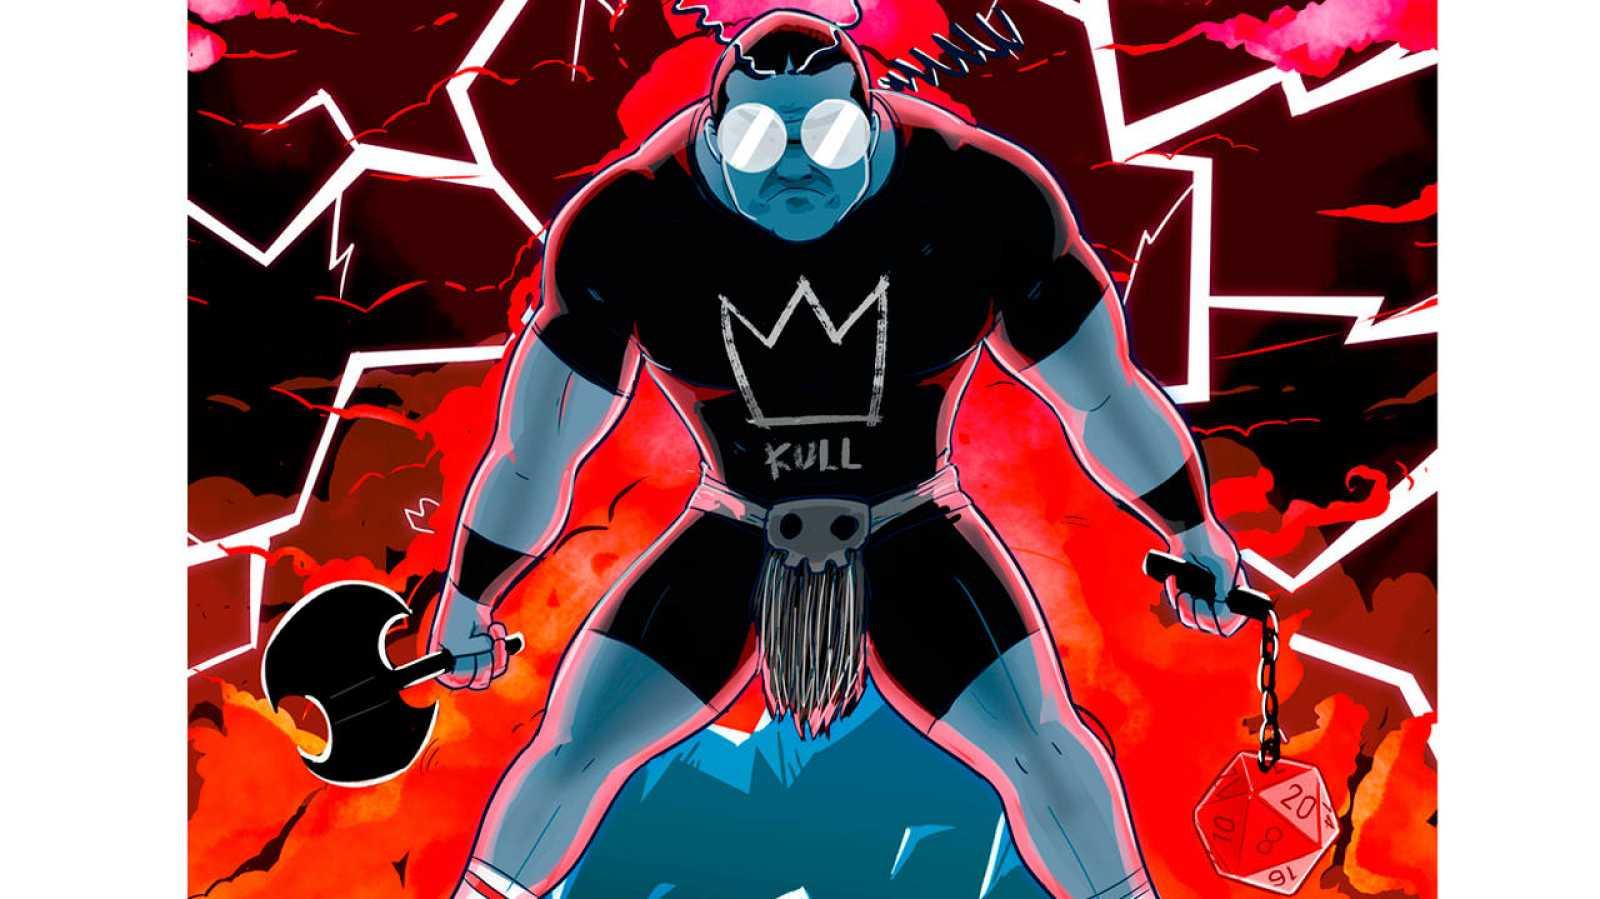 Fragmento de la portada de '¡Por Crom!'